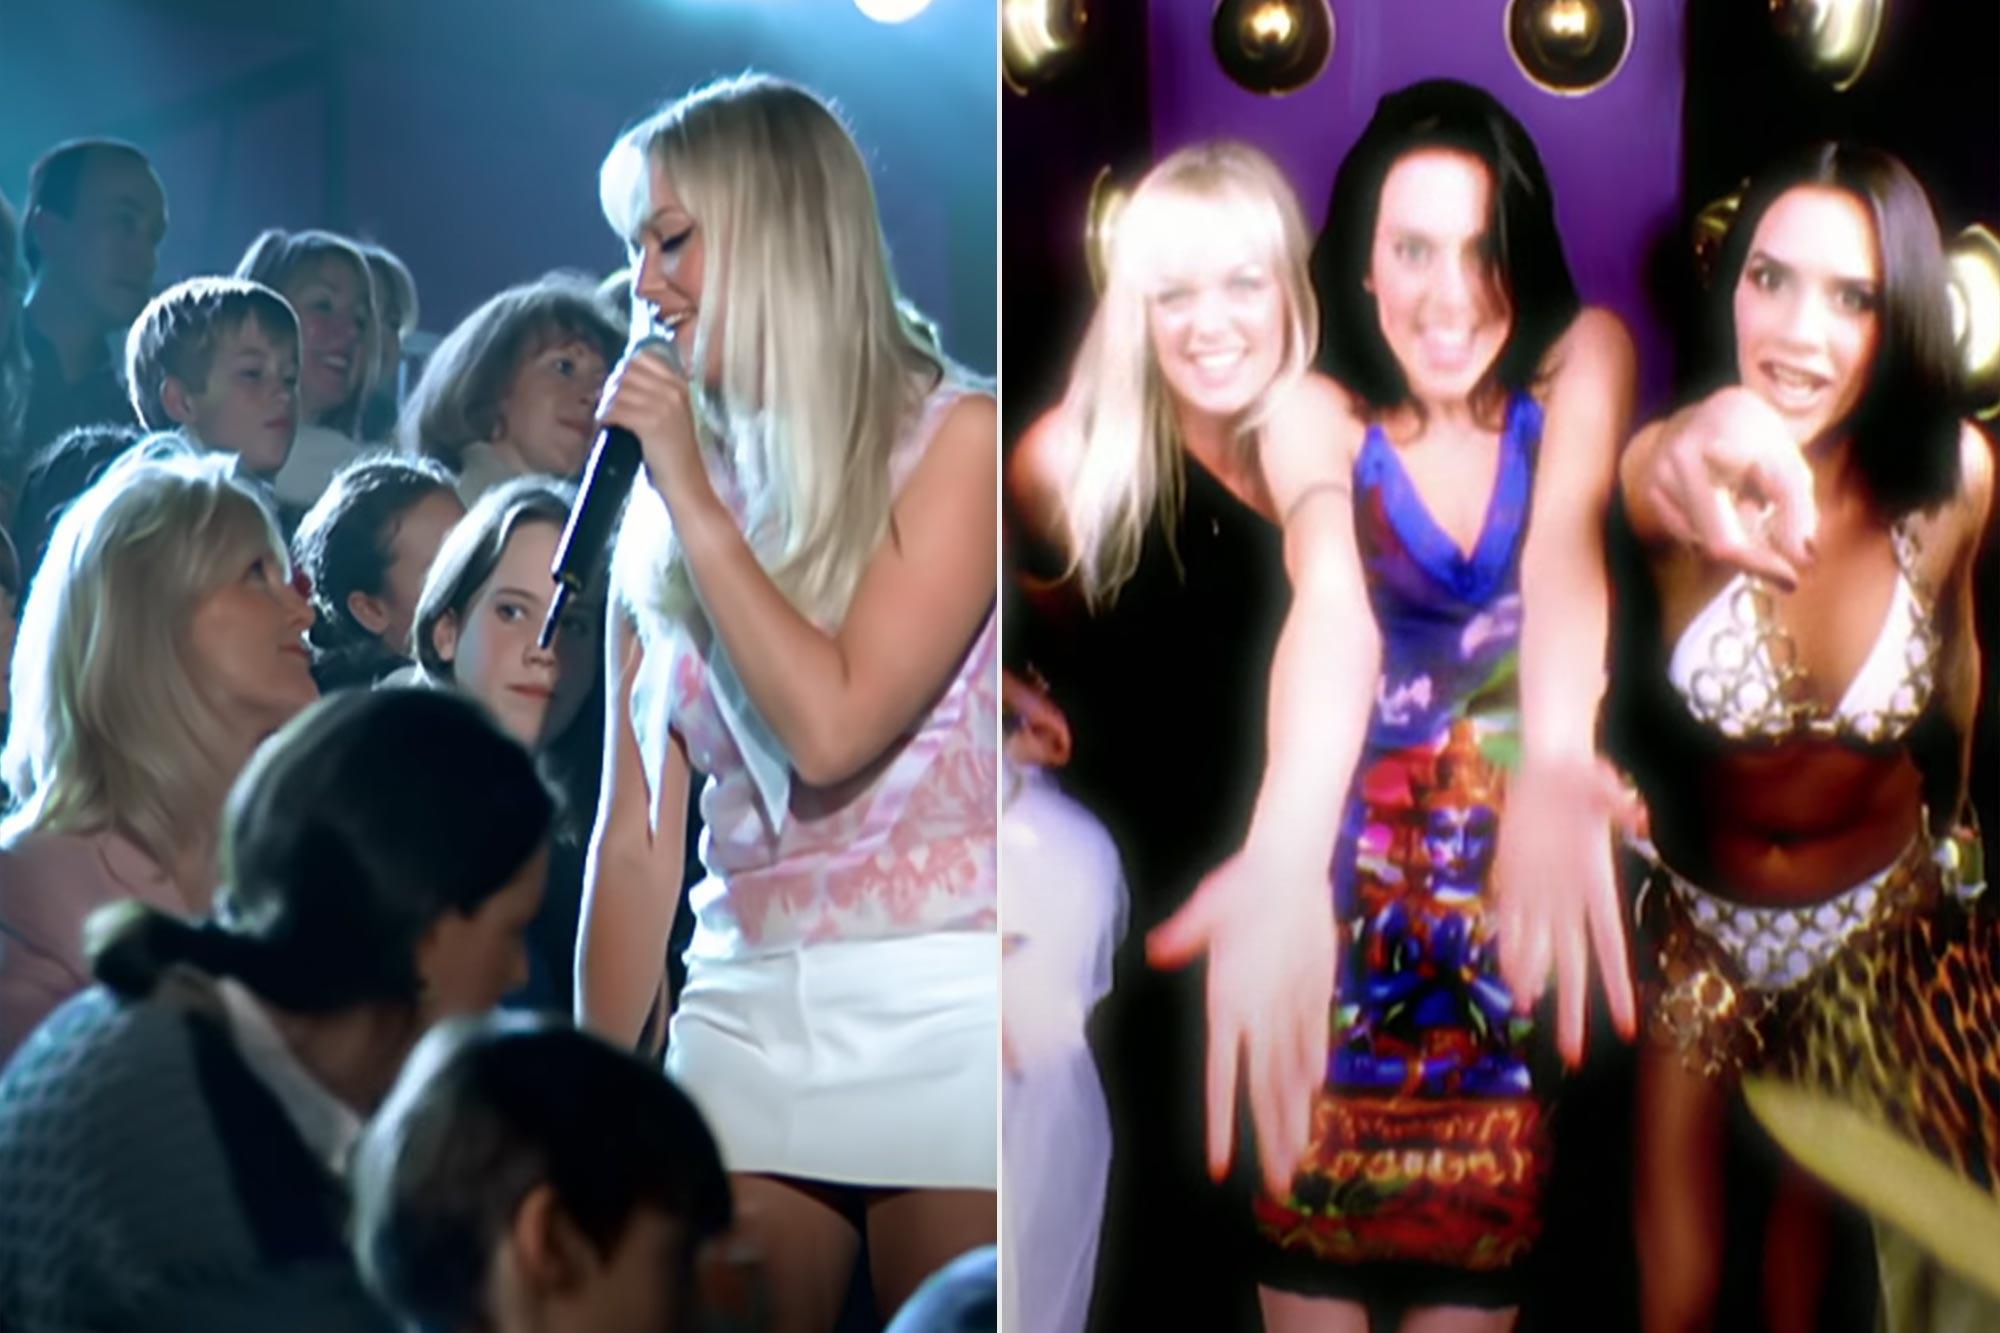 Ranking the Spice Girls singles